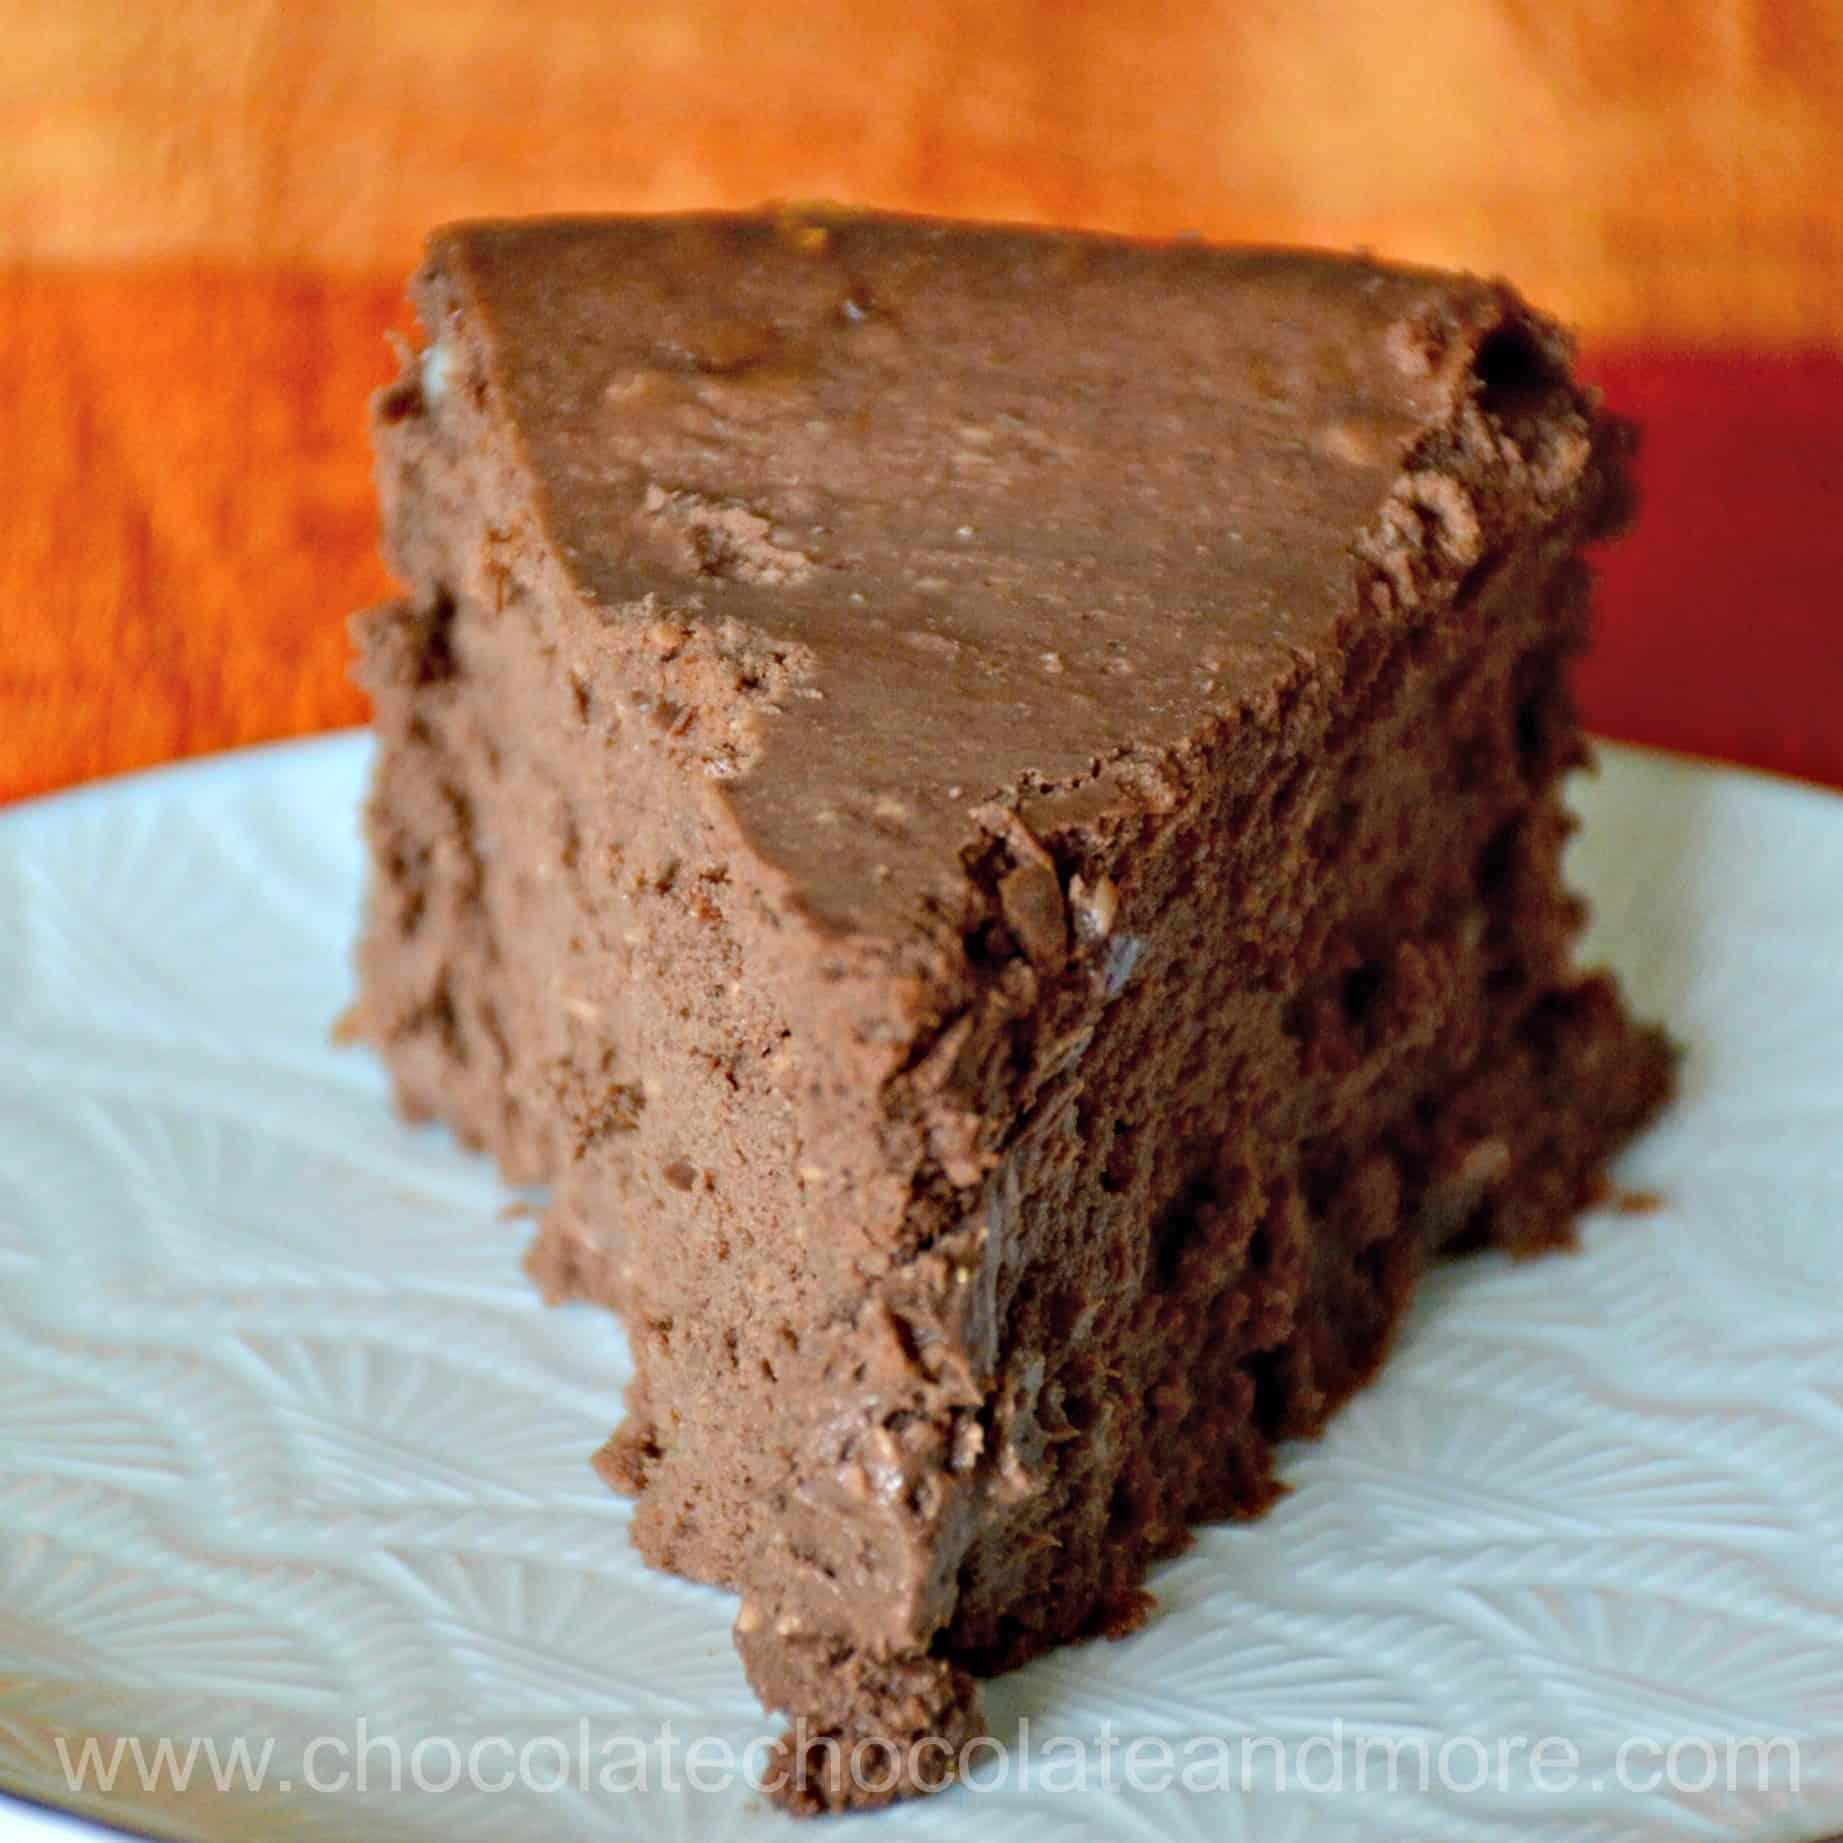 Chocolate Orange Cheesecake Chocolate Chocolate And More